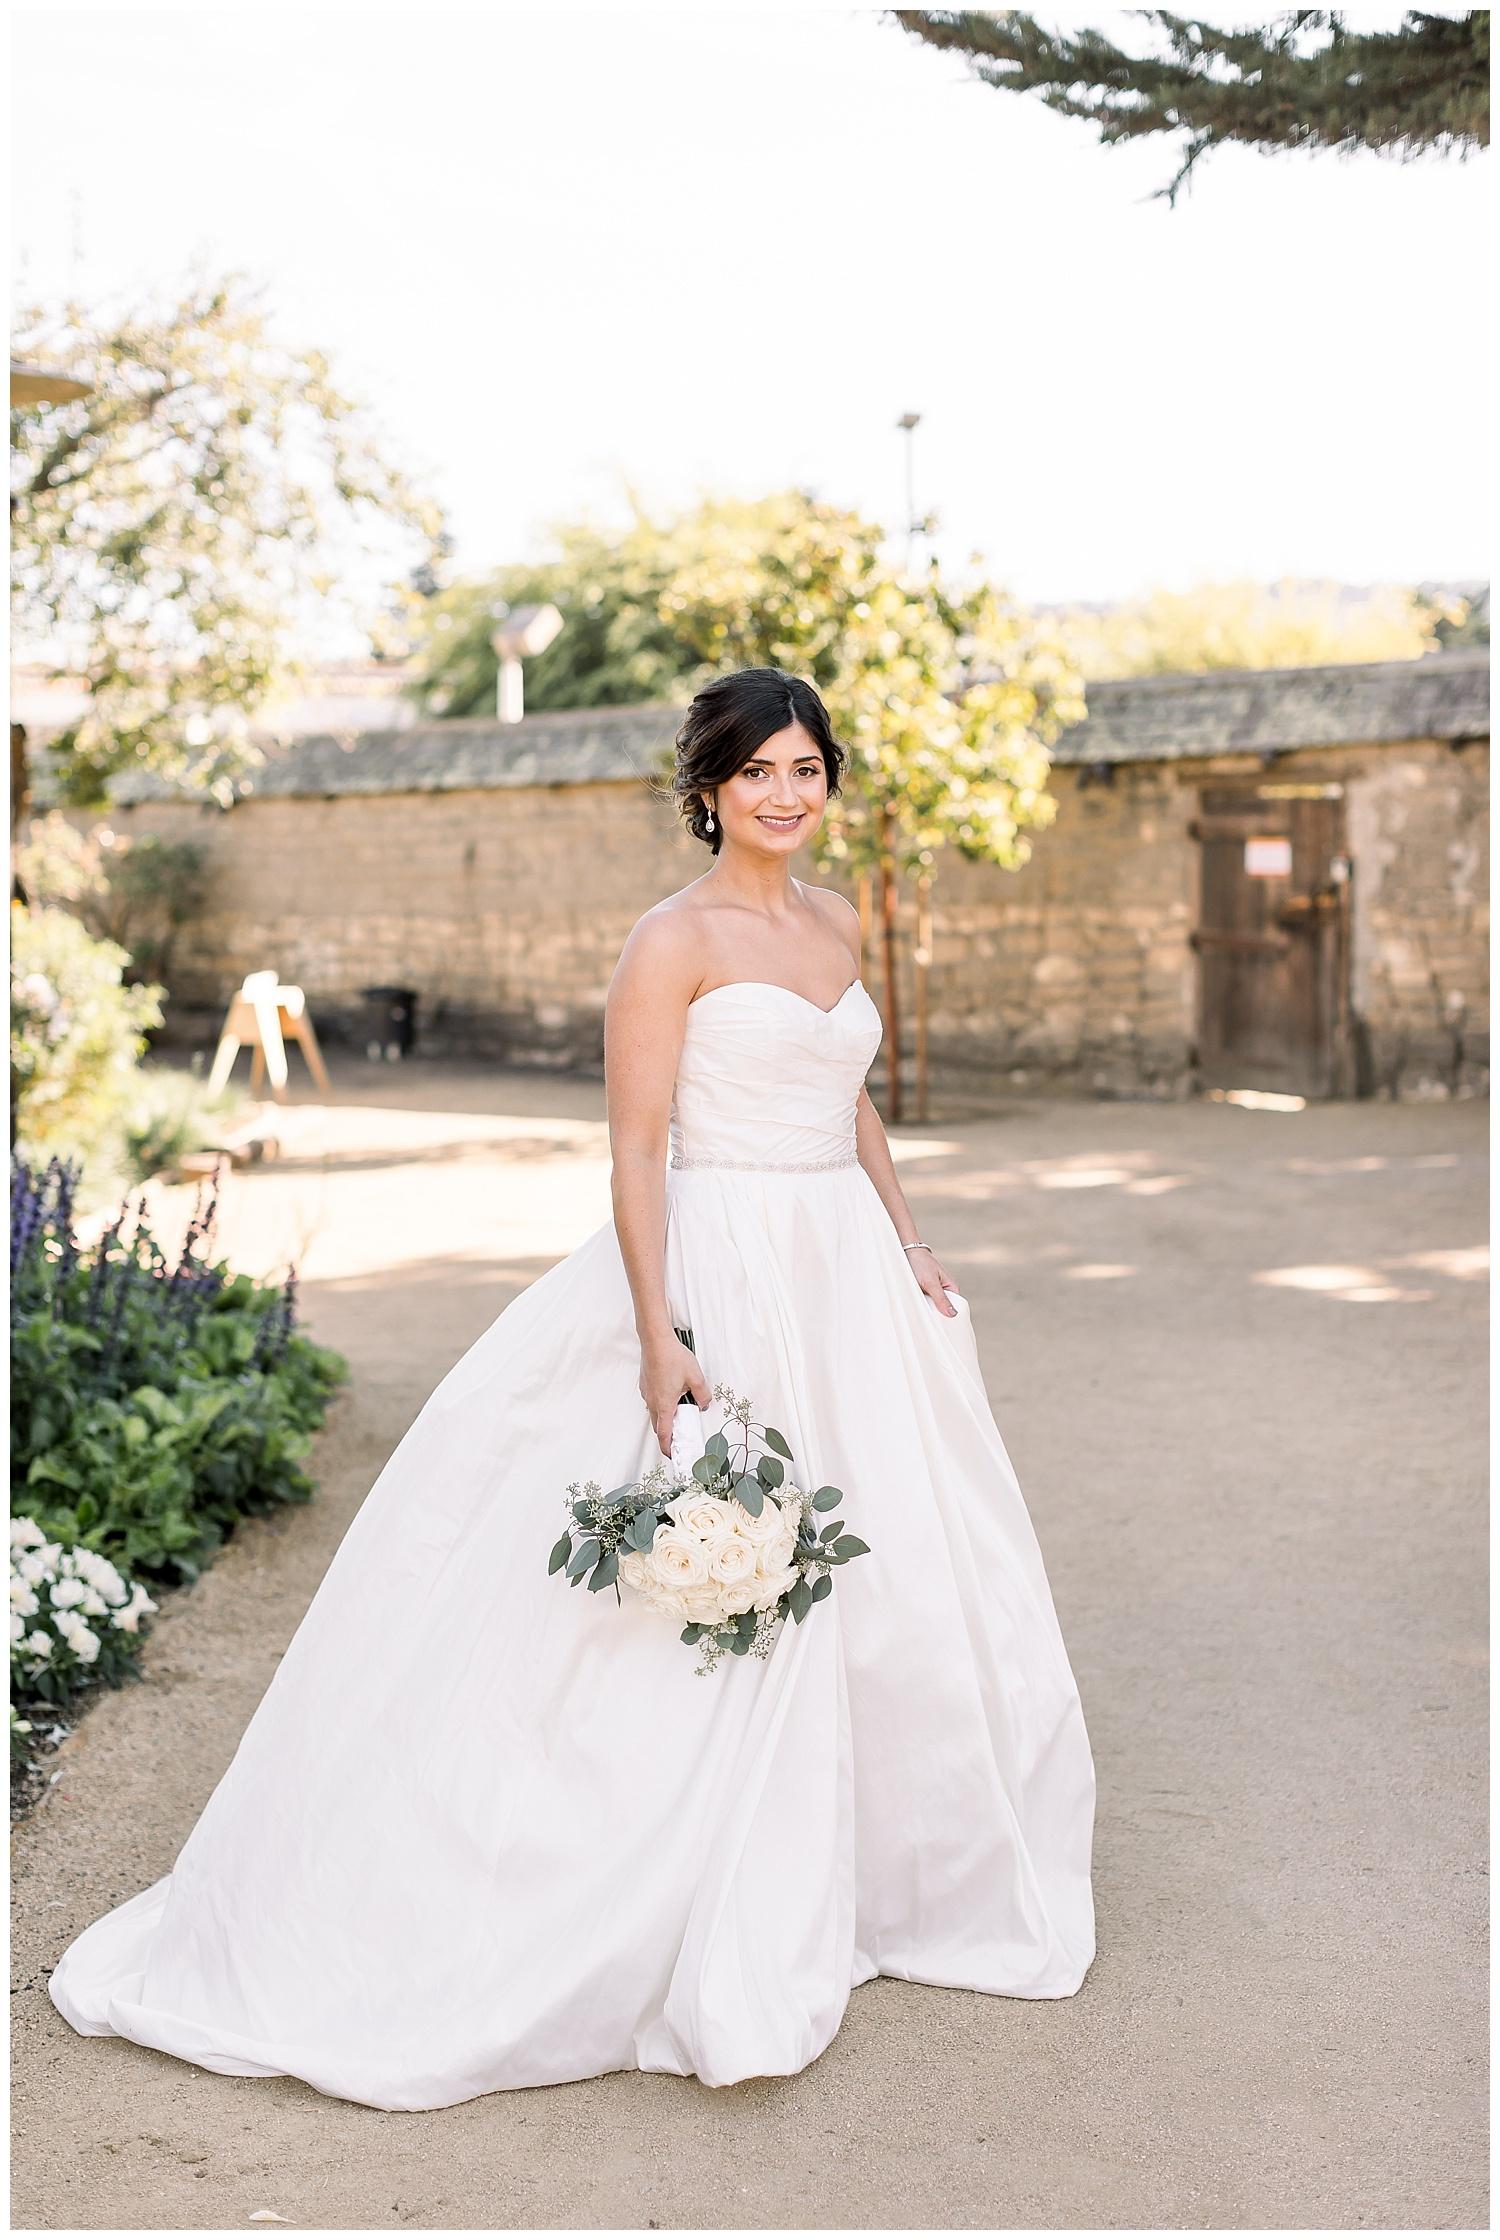 the-barns-cooper-molera-summer-bride-wedding-dress-ags-photoart-epiphany-boutique.jpg